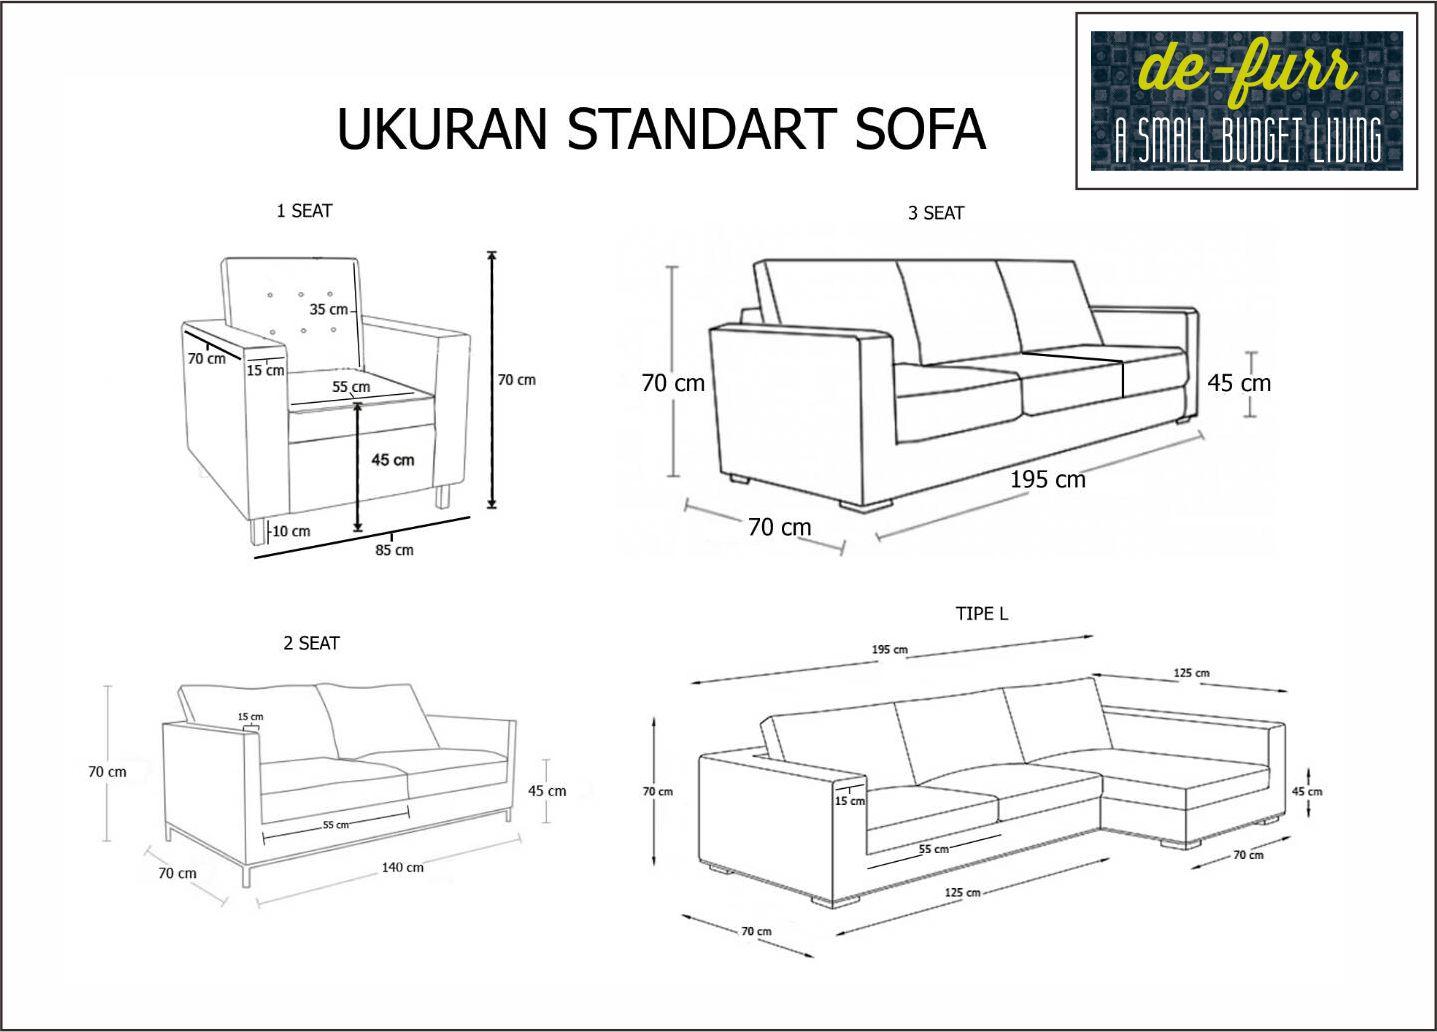 Ukuran Sofa 2 Seater Farmersagentartruiz Com